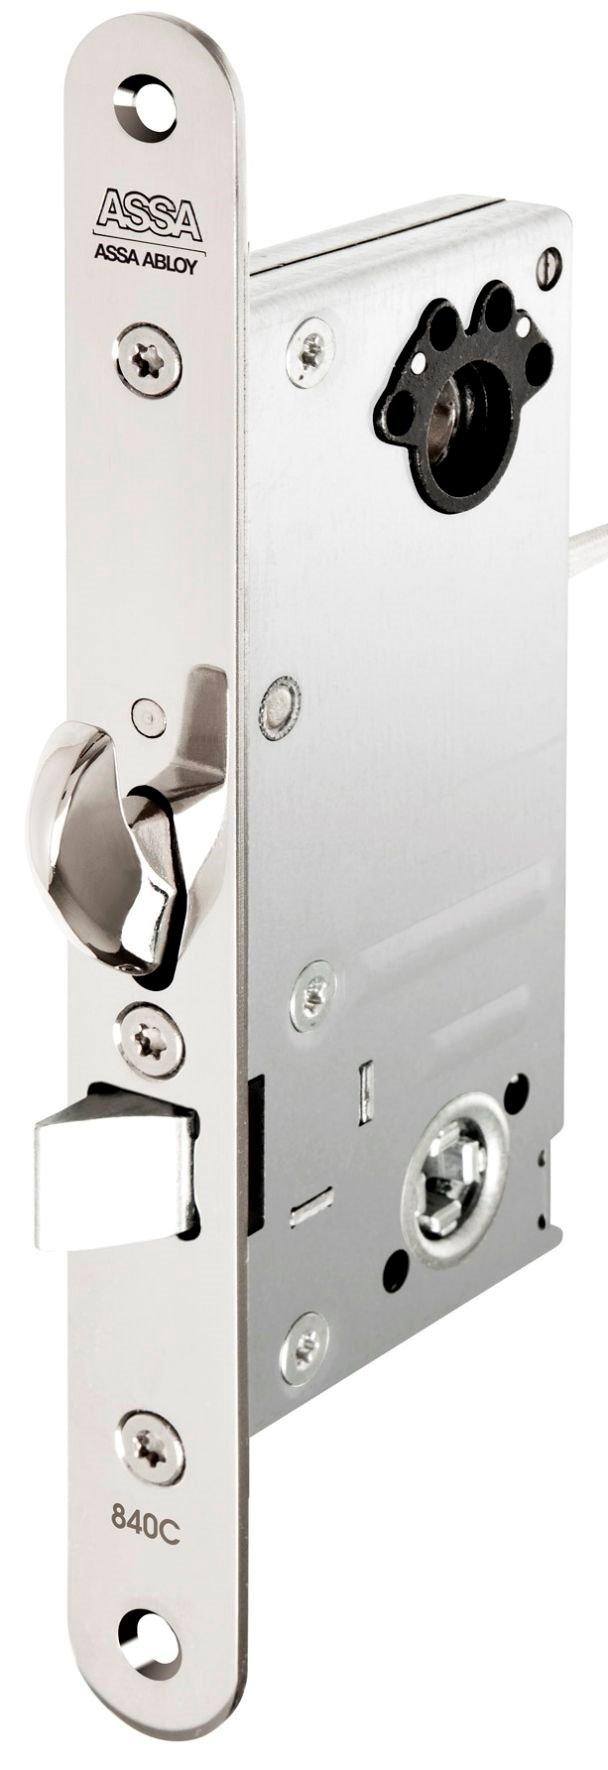 Elektrisk lås - Næring